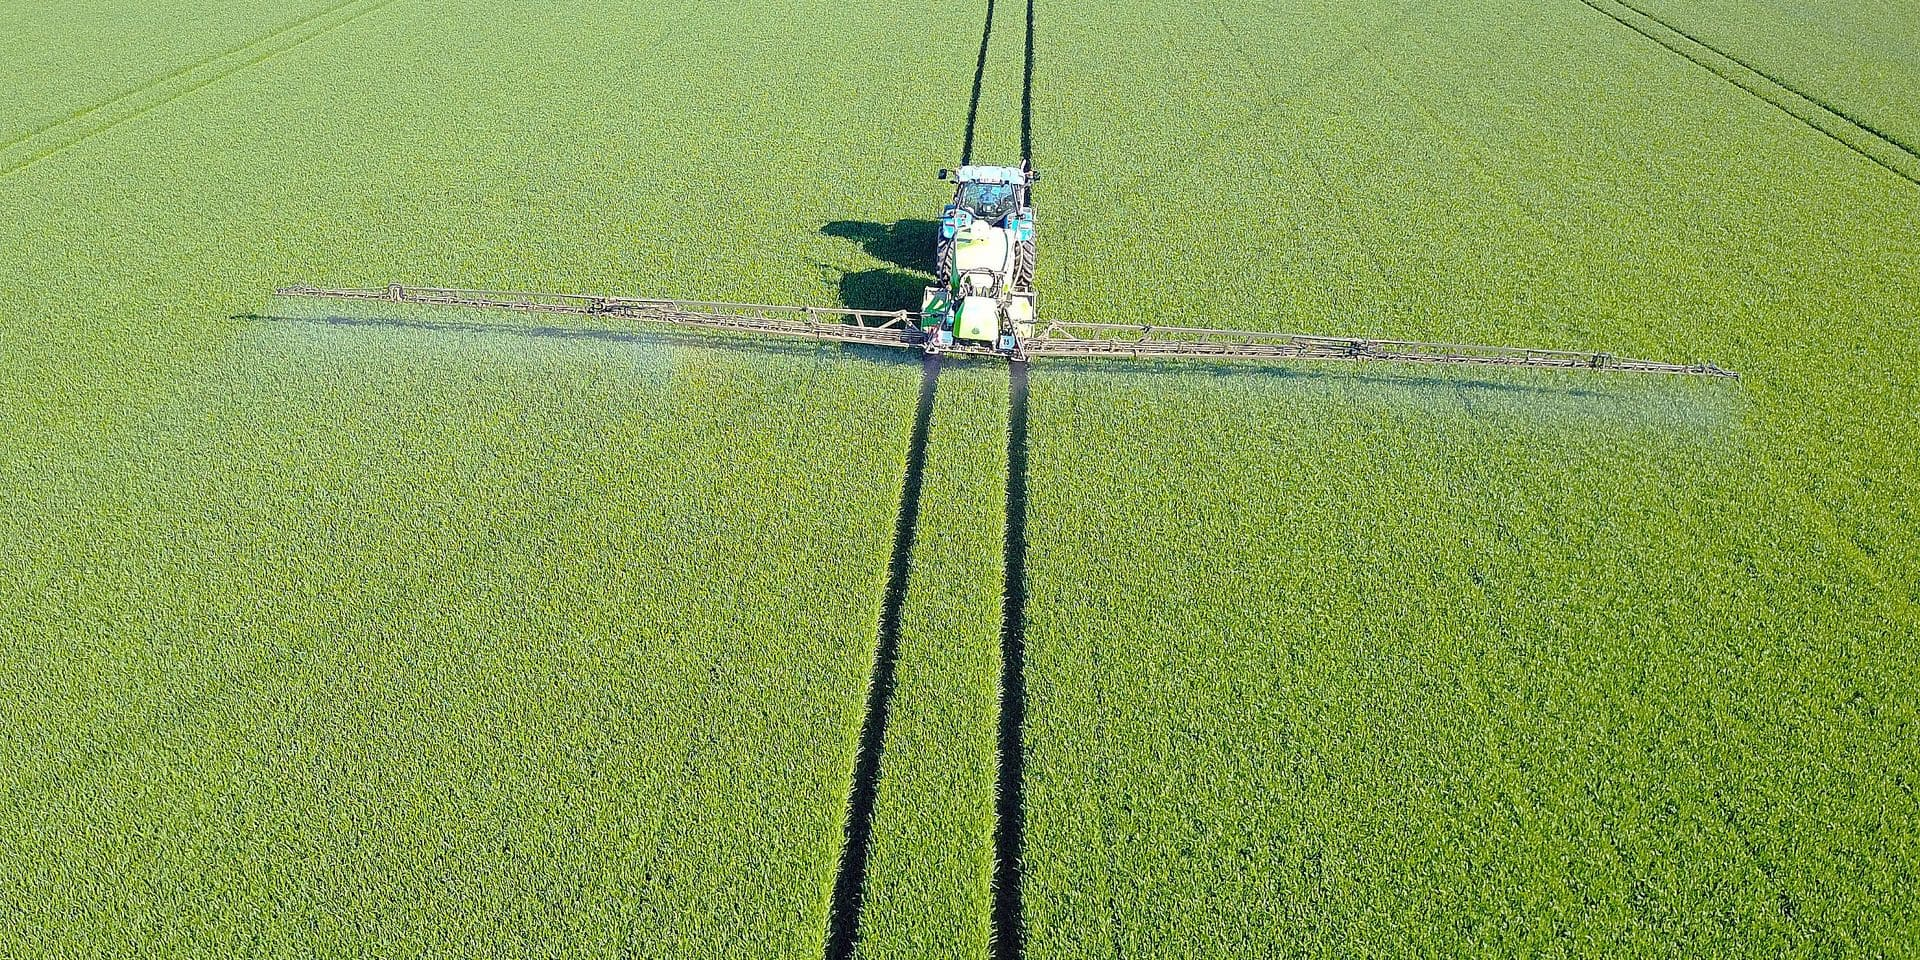 pulverisation Alain Boigelot Gesves planete environnement terre cereales culture agriculture chimie agro machine agricole tracteur phyto engrais